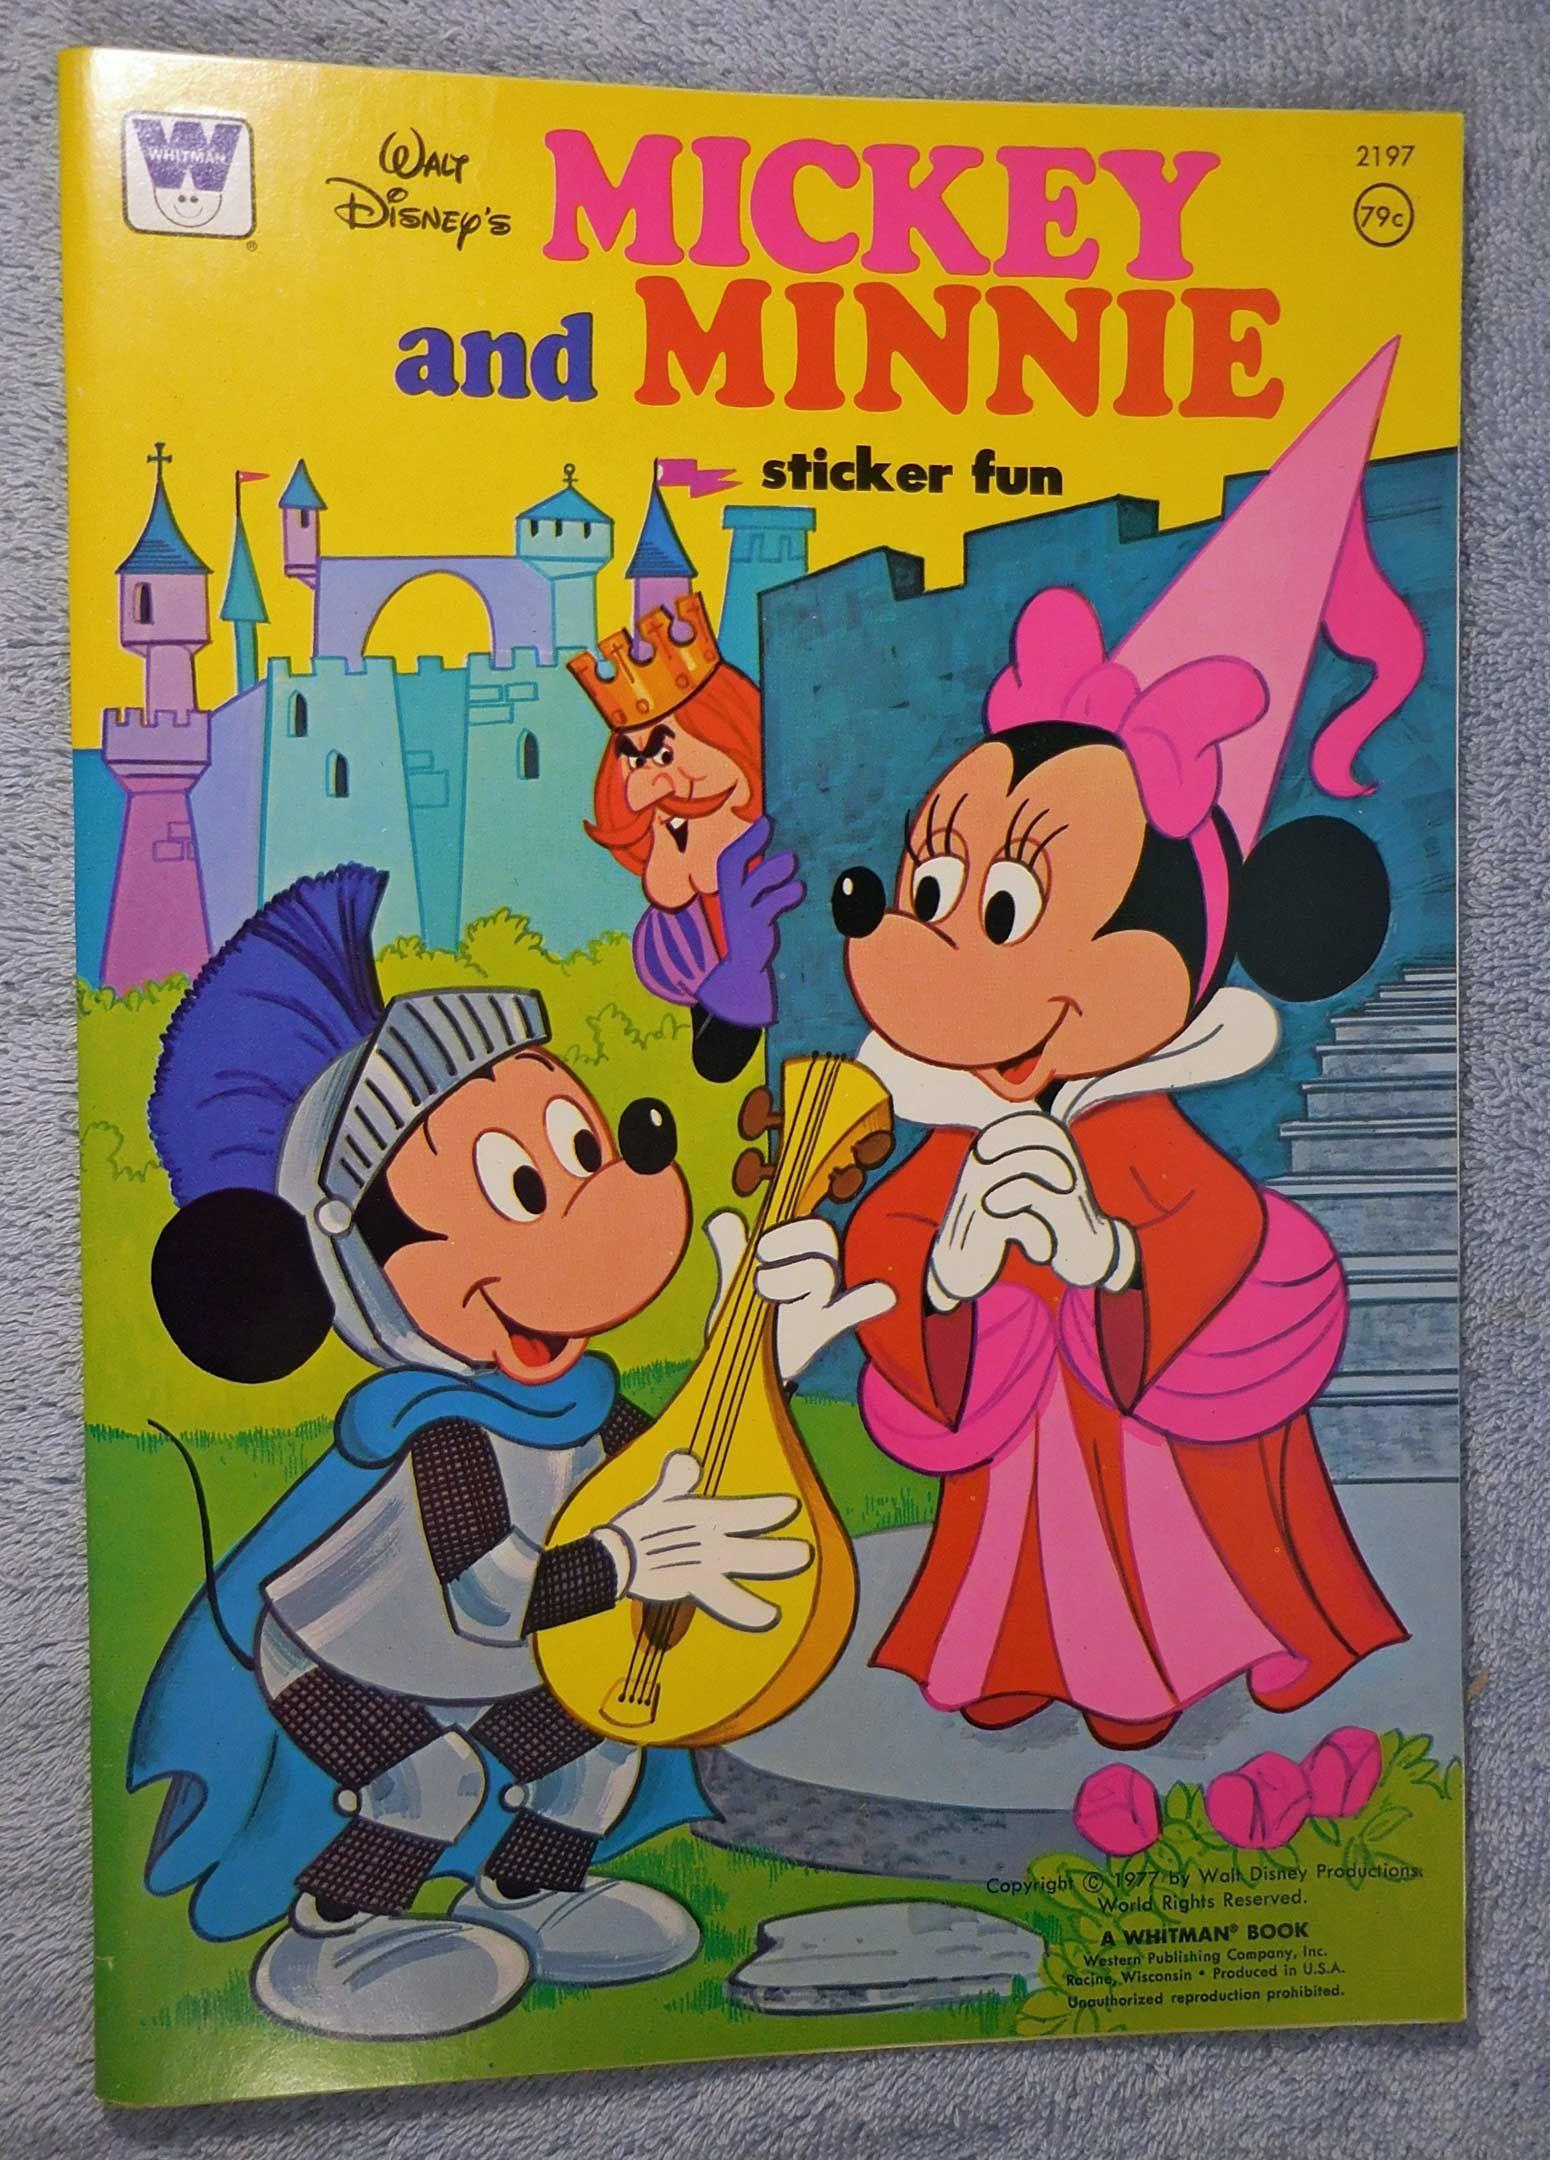 Walt Disneys Mickey And Minnie Sticker Fun Book Whitman Publishing 1977 From Disneyland Treasures Ebay Store